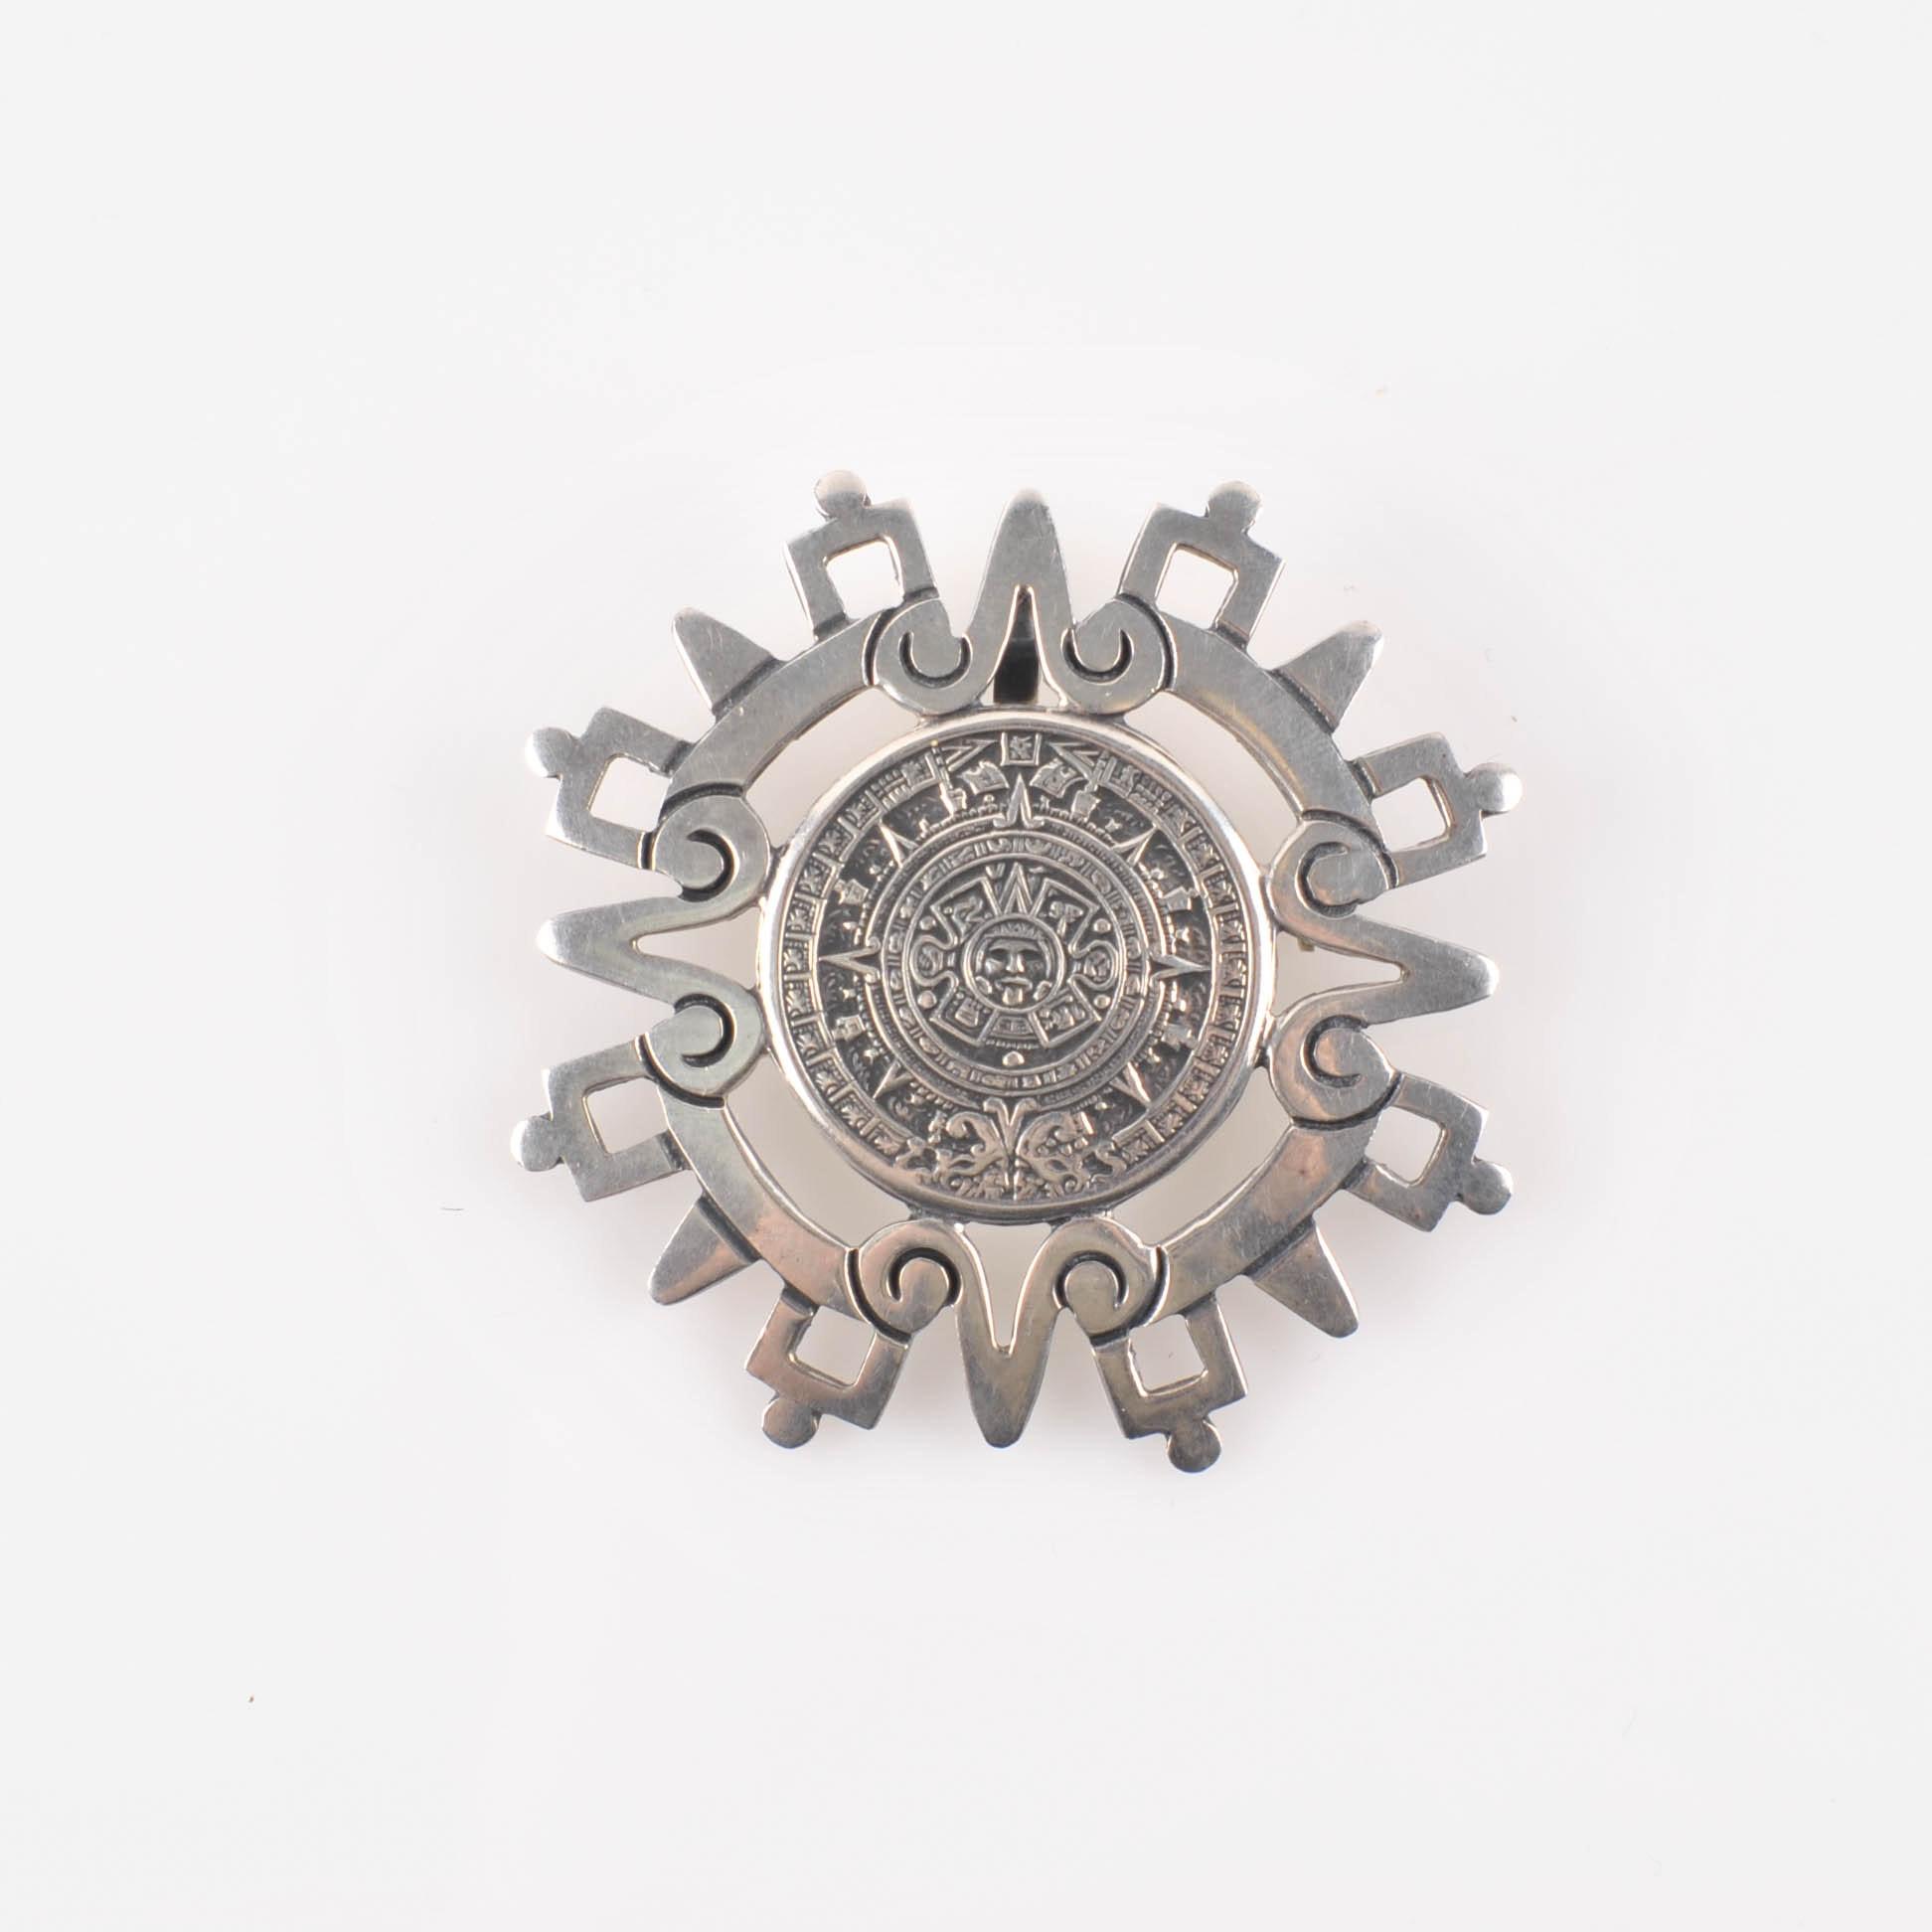 Vintage Taxco Mexico Sterling Aztec Calendar Brooch or Pendant